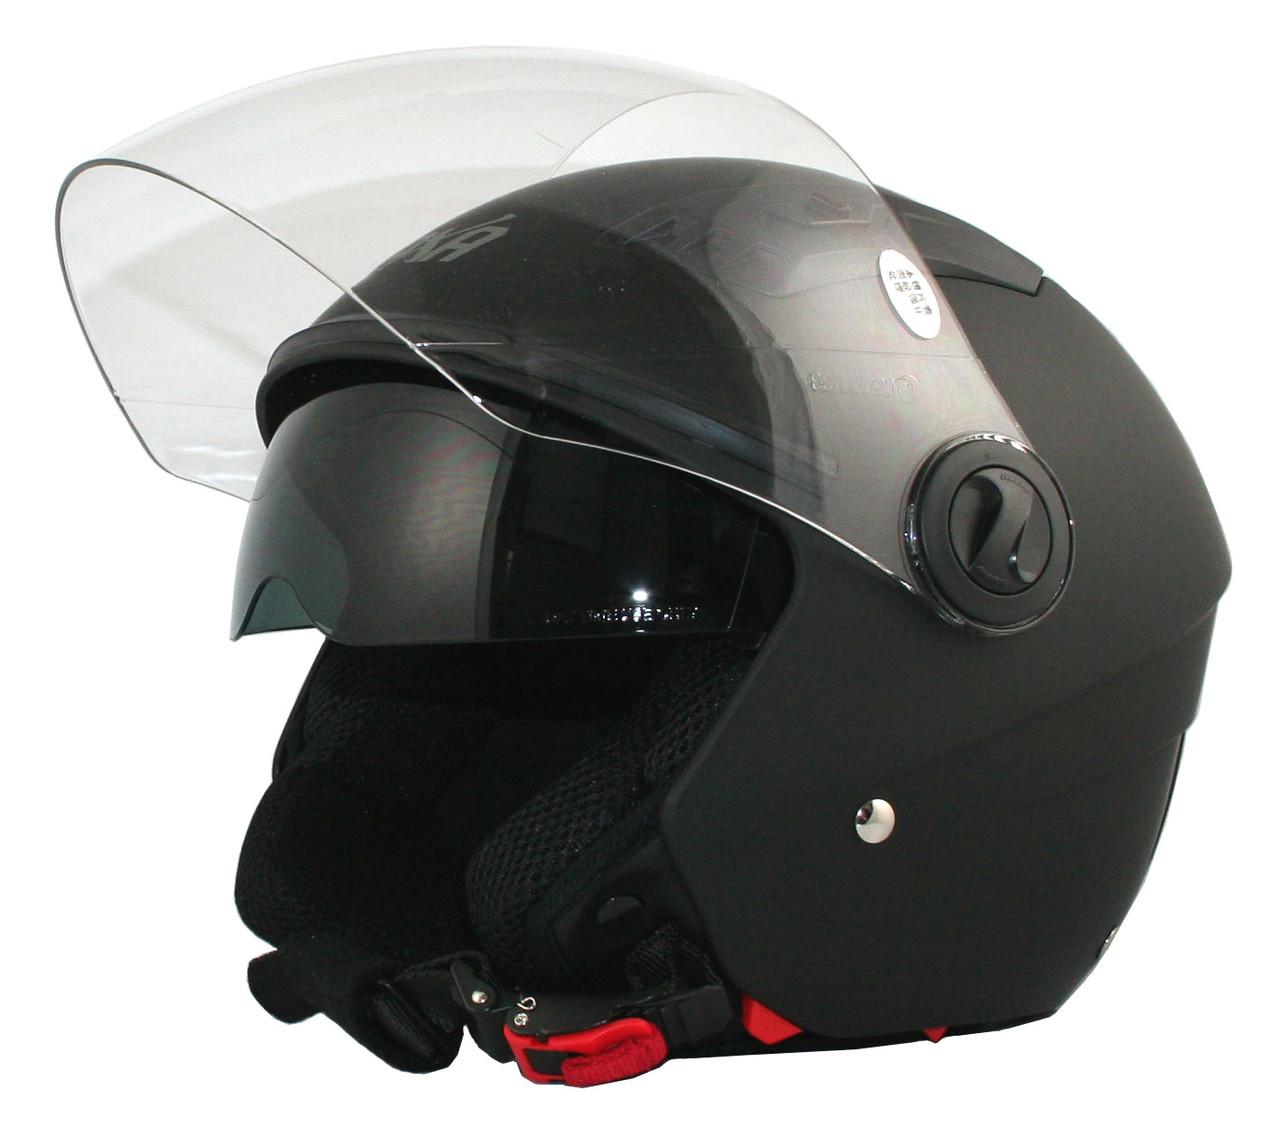 Мотоциклетный шлем NAXA S16B r.M + BLENDA